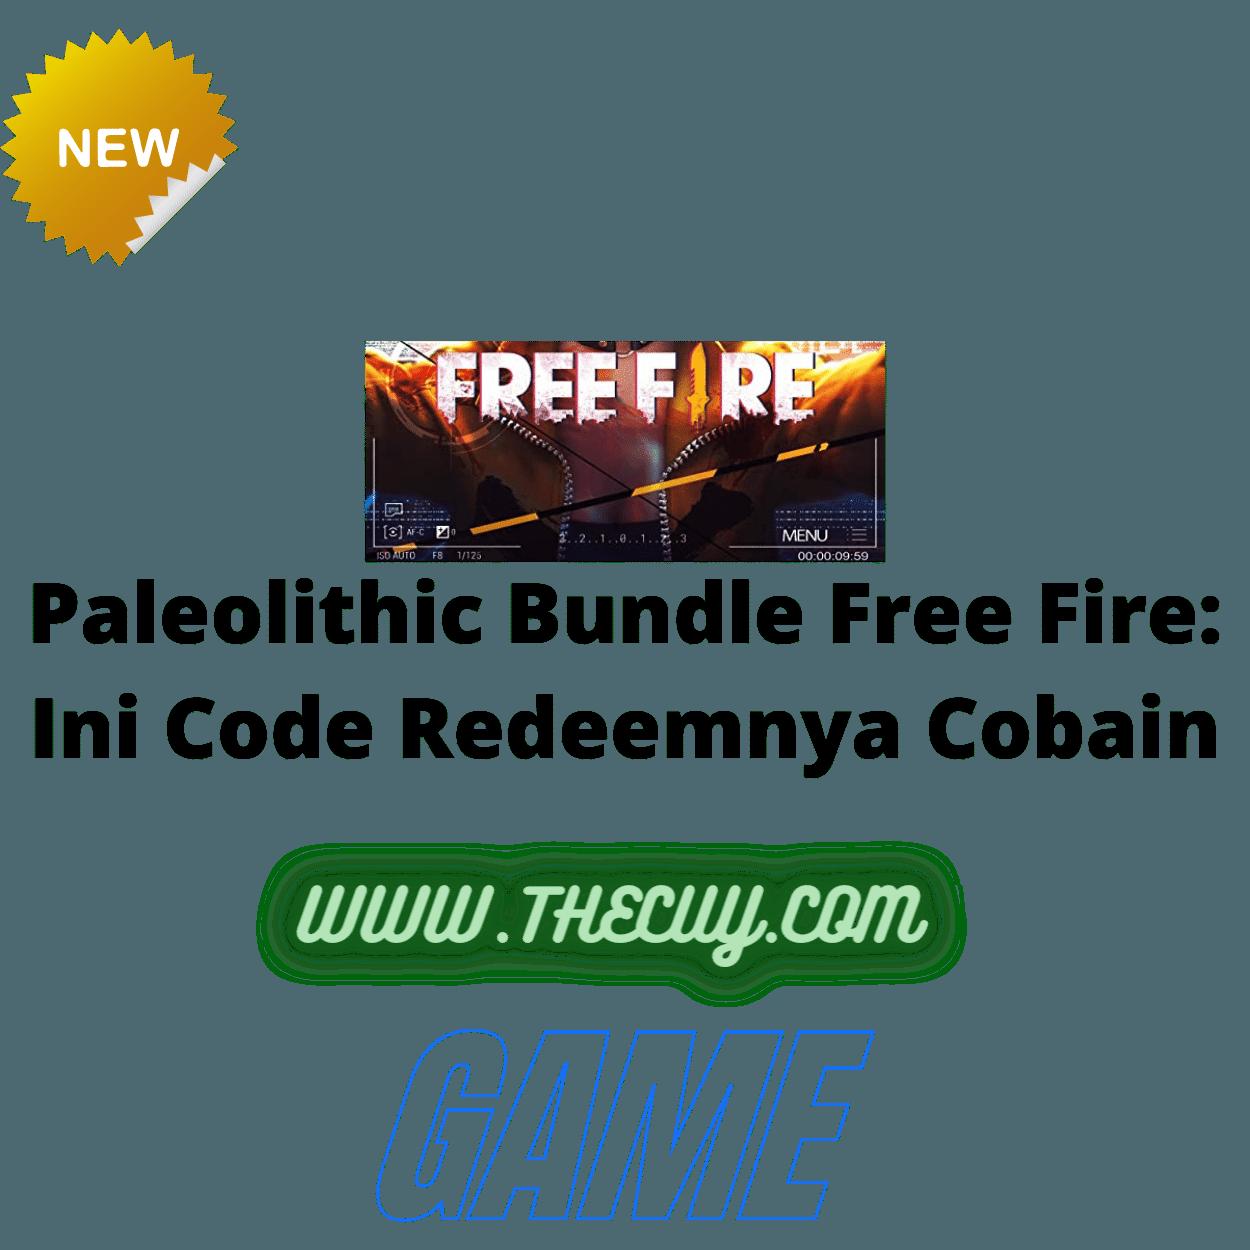 Paleolithic Bundle Free Fire: Ini Code Redeemnya Cobain